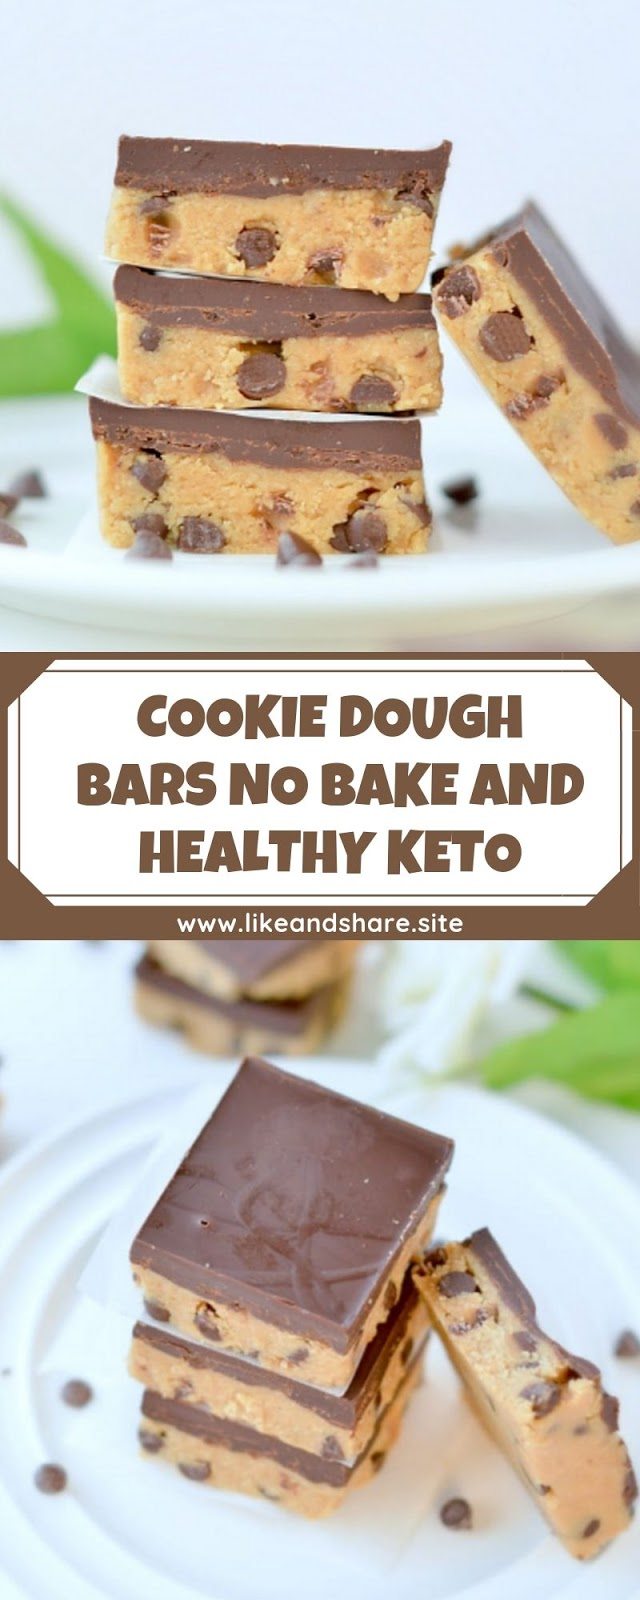 COOKIE DOUGH BARS NO BAKE AND HEALTHY KETO